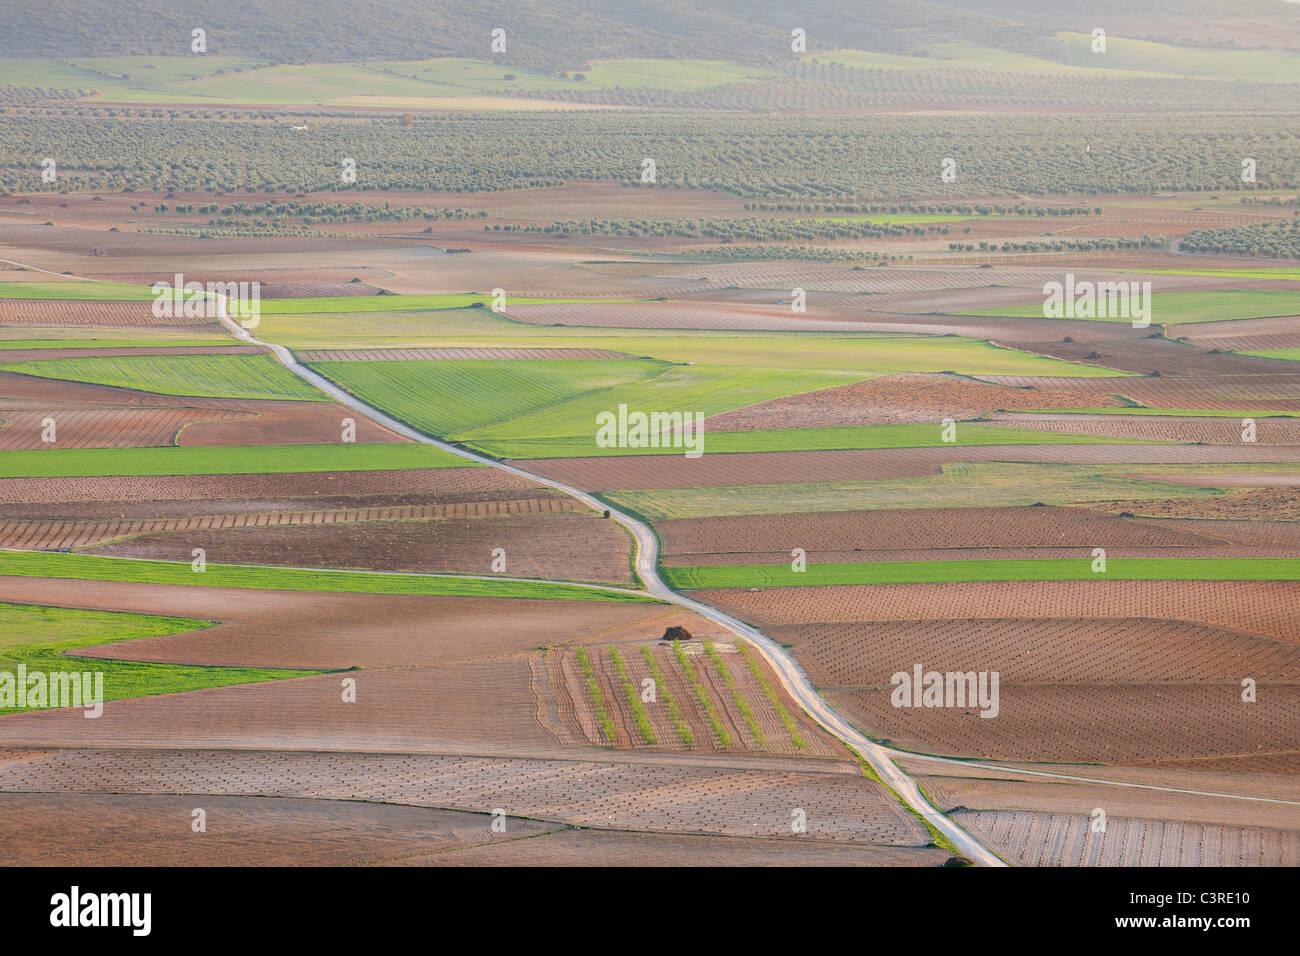 Spain, Castilla-La Mancha, Toledo Province, Consuegra, View of dirt road passing through fields - Stock Image